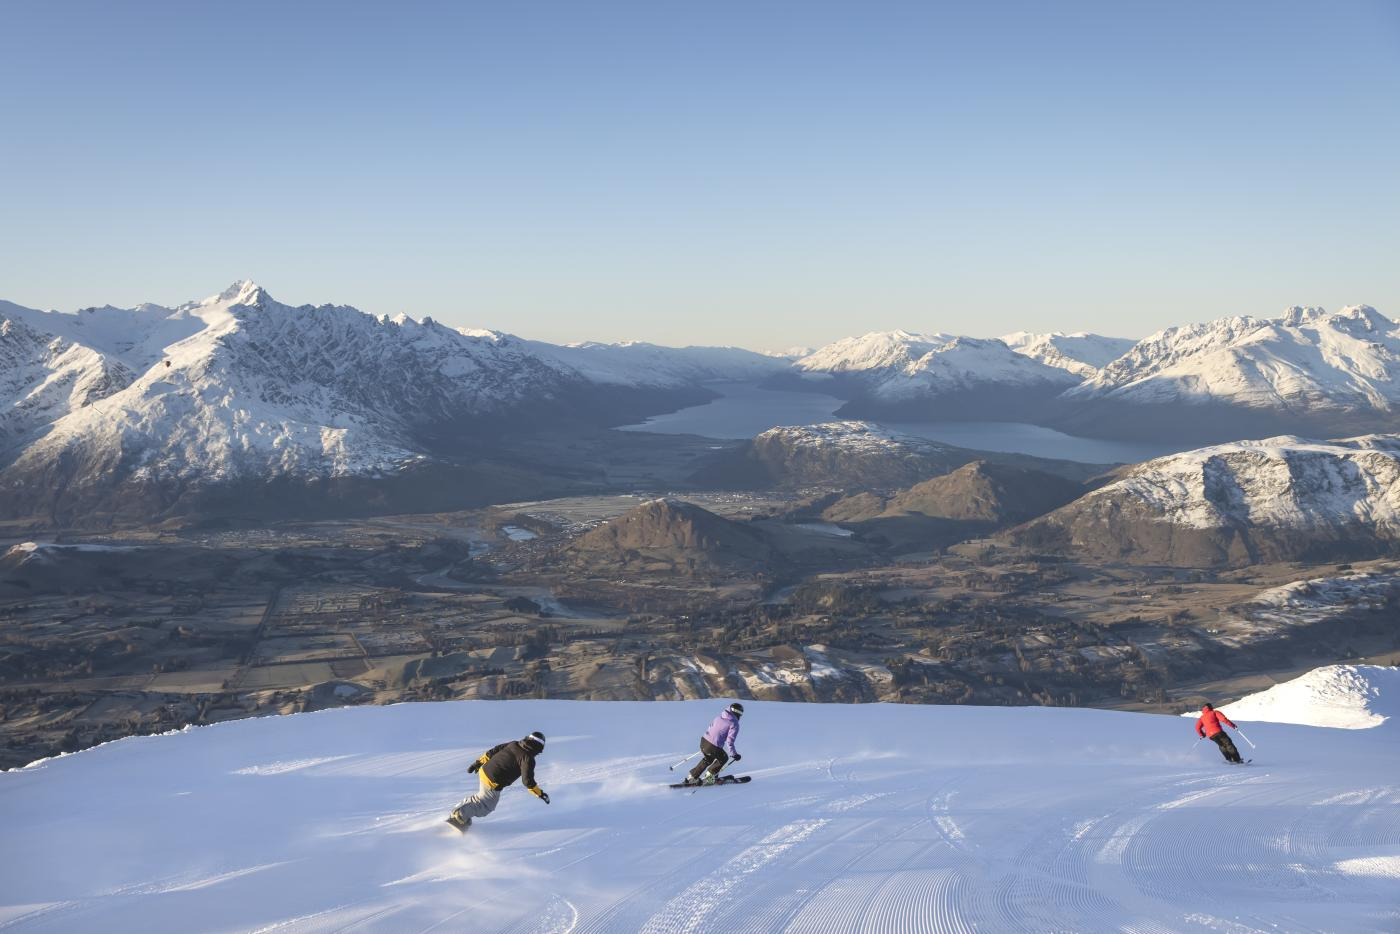 Snowboarding at Coronet Peak